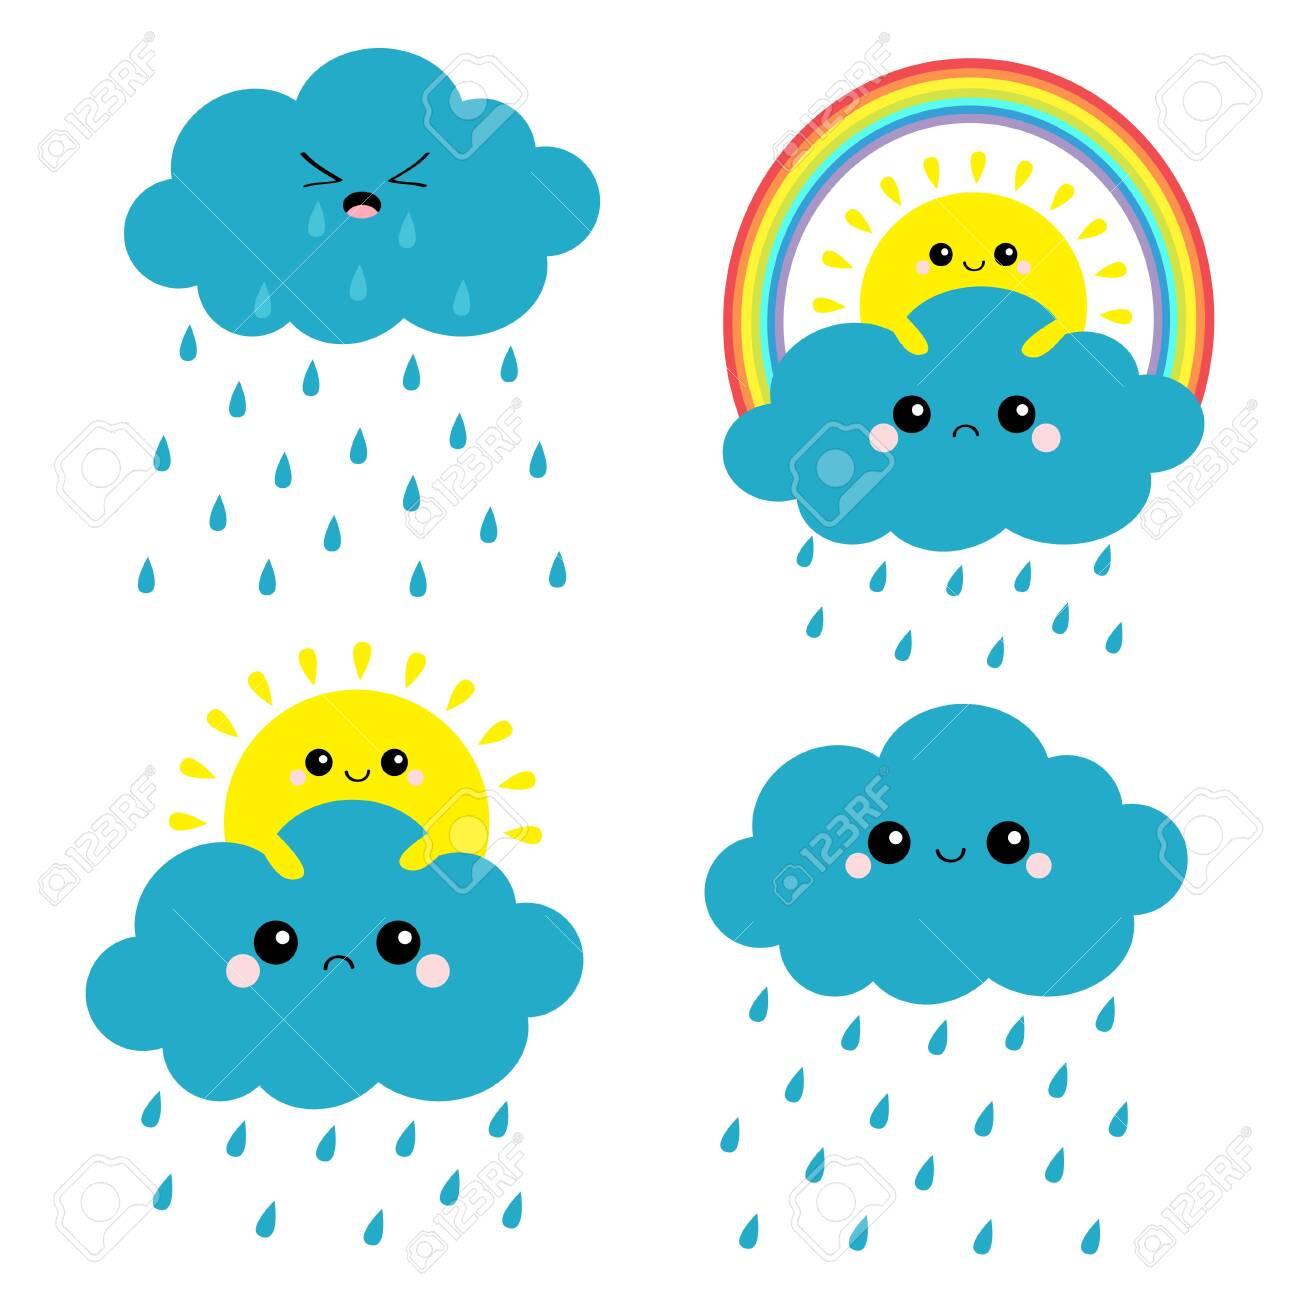 ᐈ Rainy hd stock wallpapers, Royalty Free rain illustrations | download on  Depositphotos®